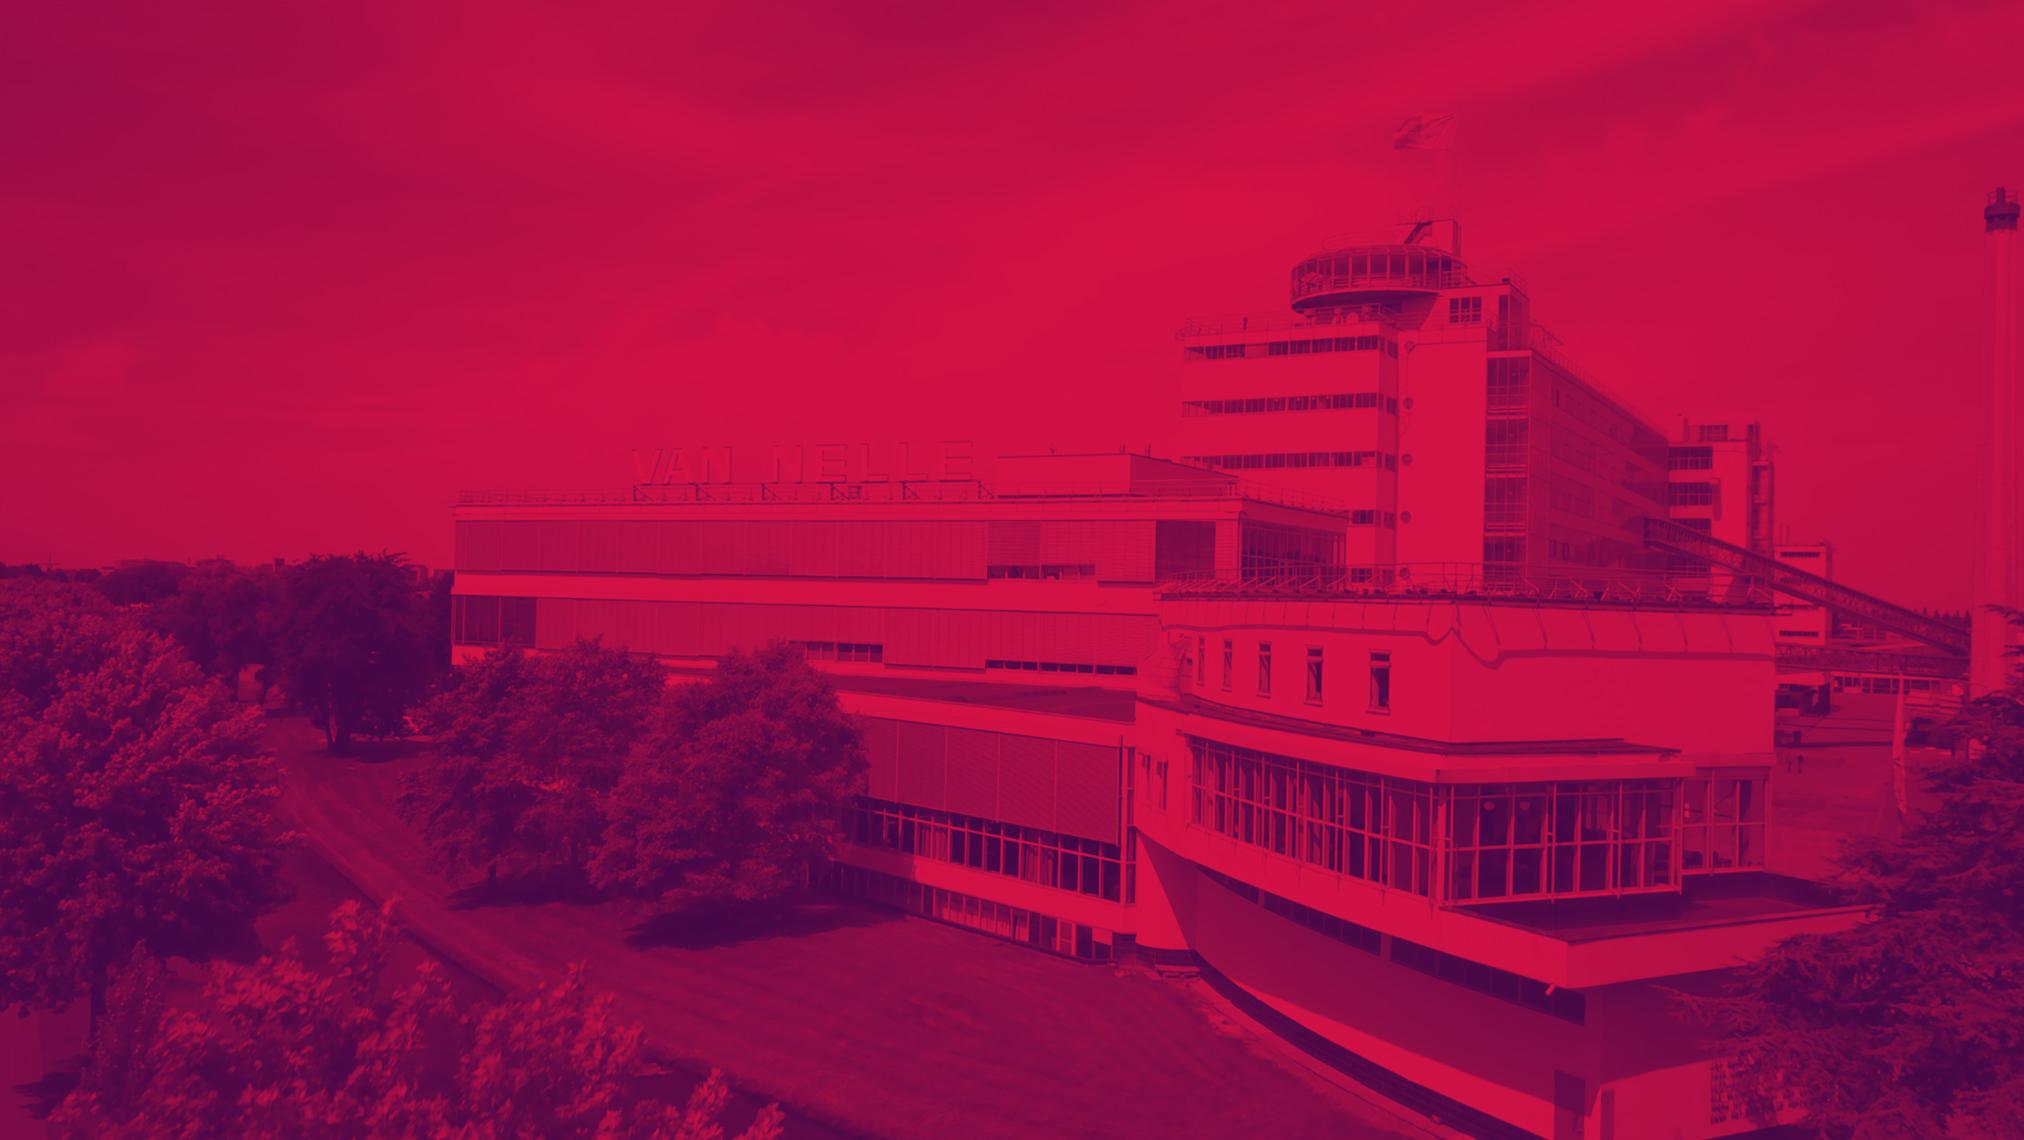 Van Nelle fabriek_rood